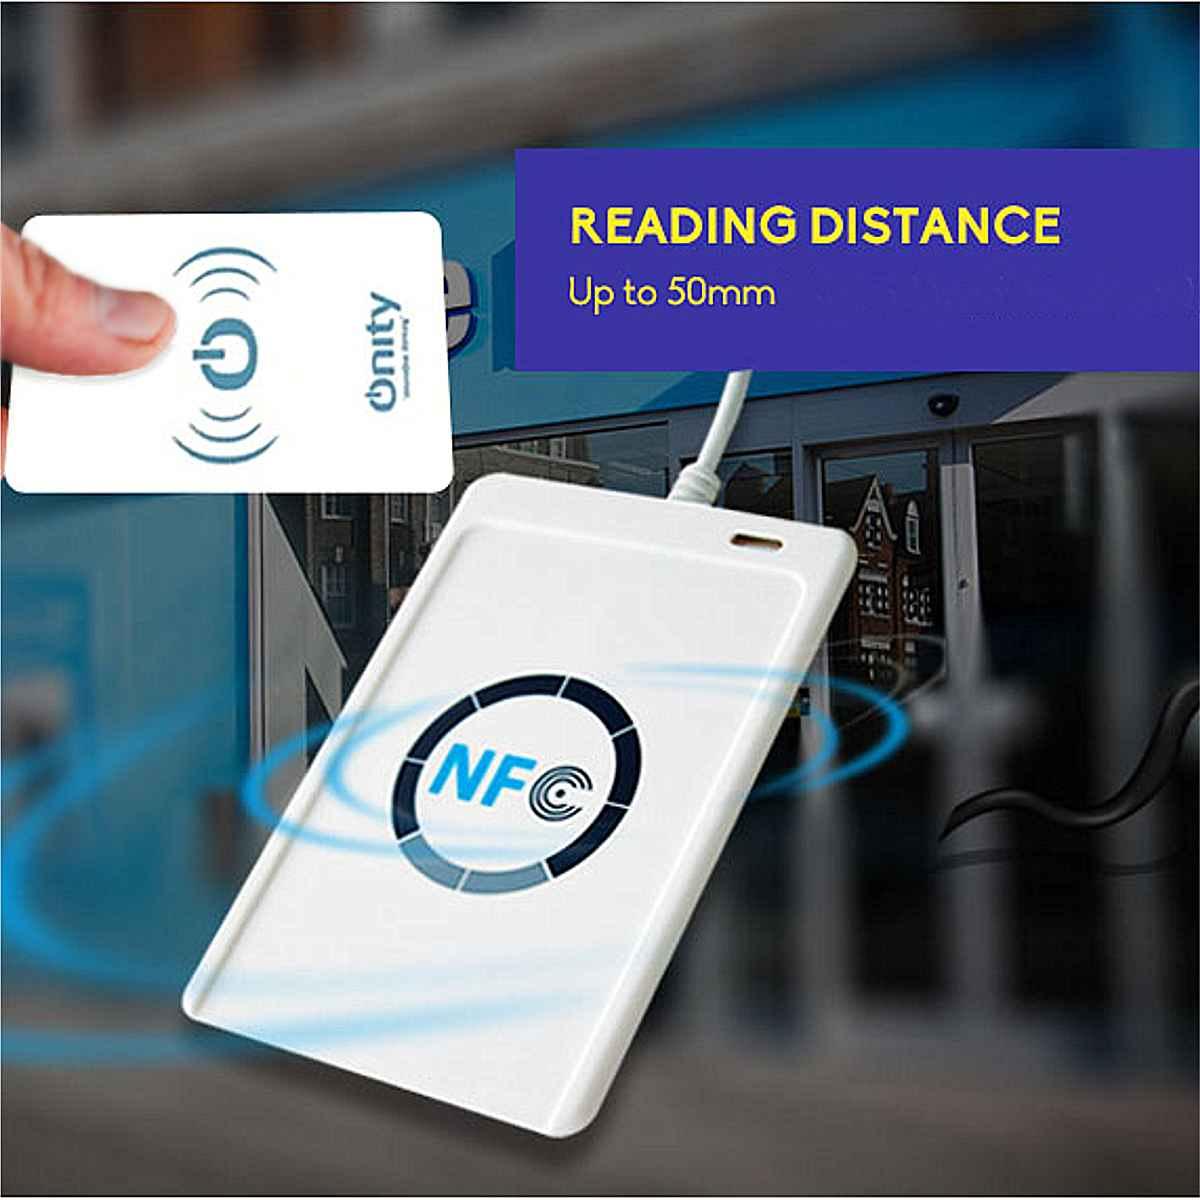 ACR122u NFC Reader Writer 13.56Mhz RFID Copier Duplicator Contactless Smart Reader Writer/USB + 5pcs UID Card + SDKACR122u NFC Reader Writer 13.56Mhz RFID Copier Duplicator Contactless Smart Reader Writer/USB + 5pcs UID Card + SDK